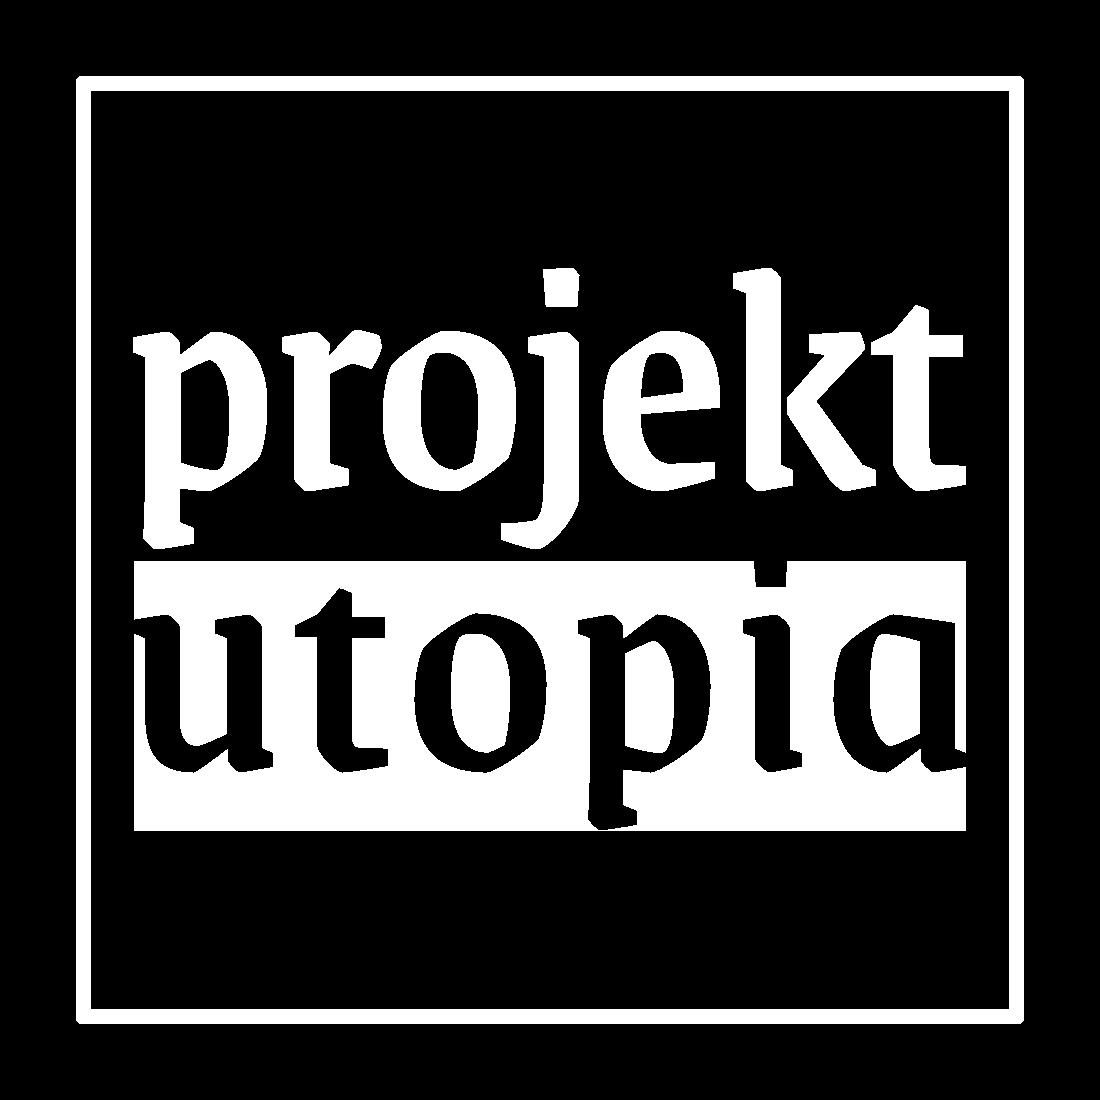 Projekt Utopia